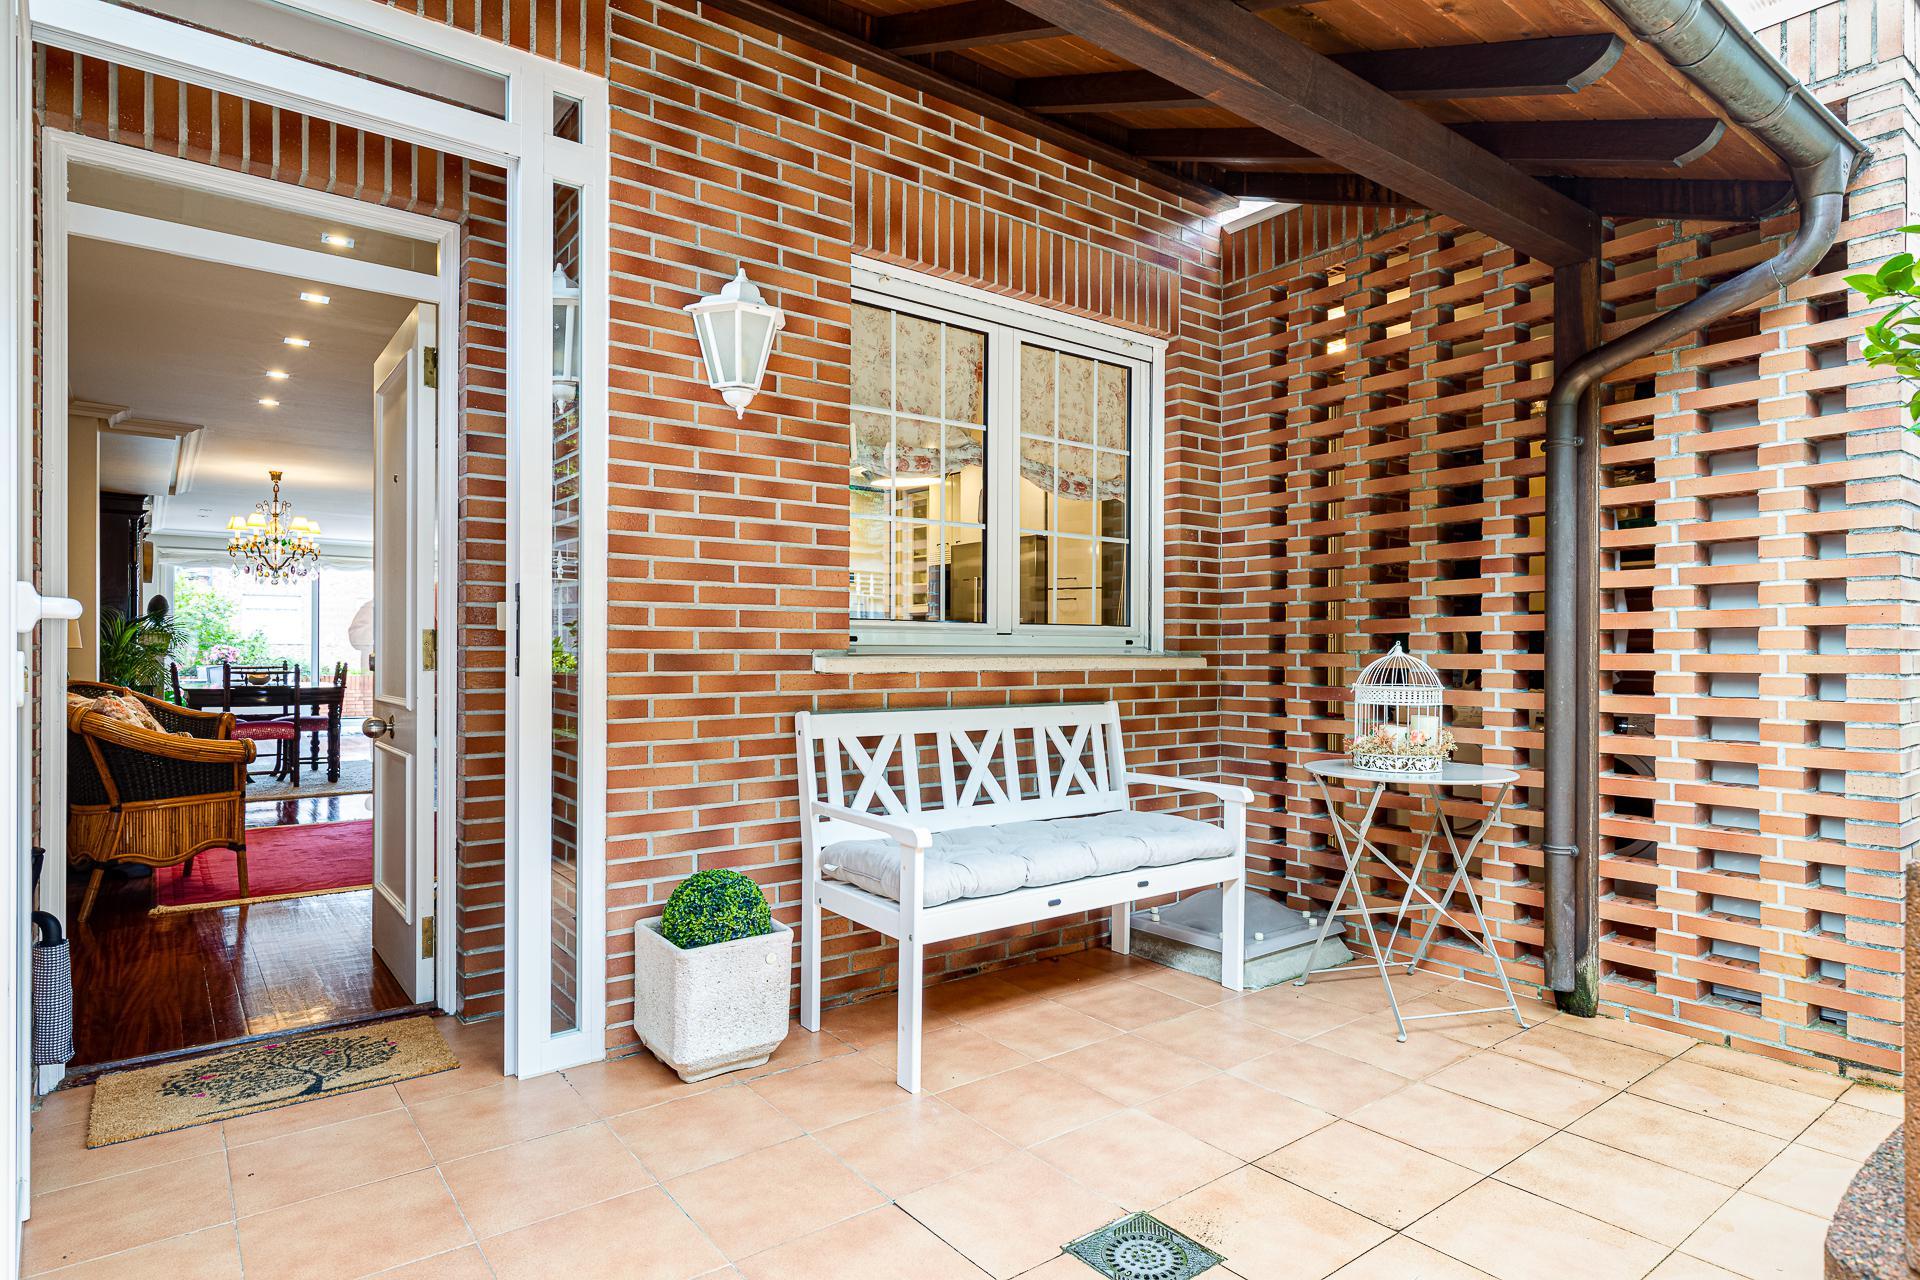 Imagen 1 Casa Aislada en venta en Donostia-San Sebastián / Berio, San Sebastián